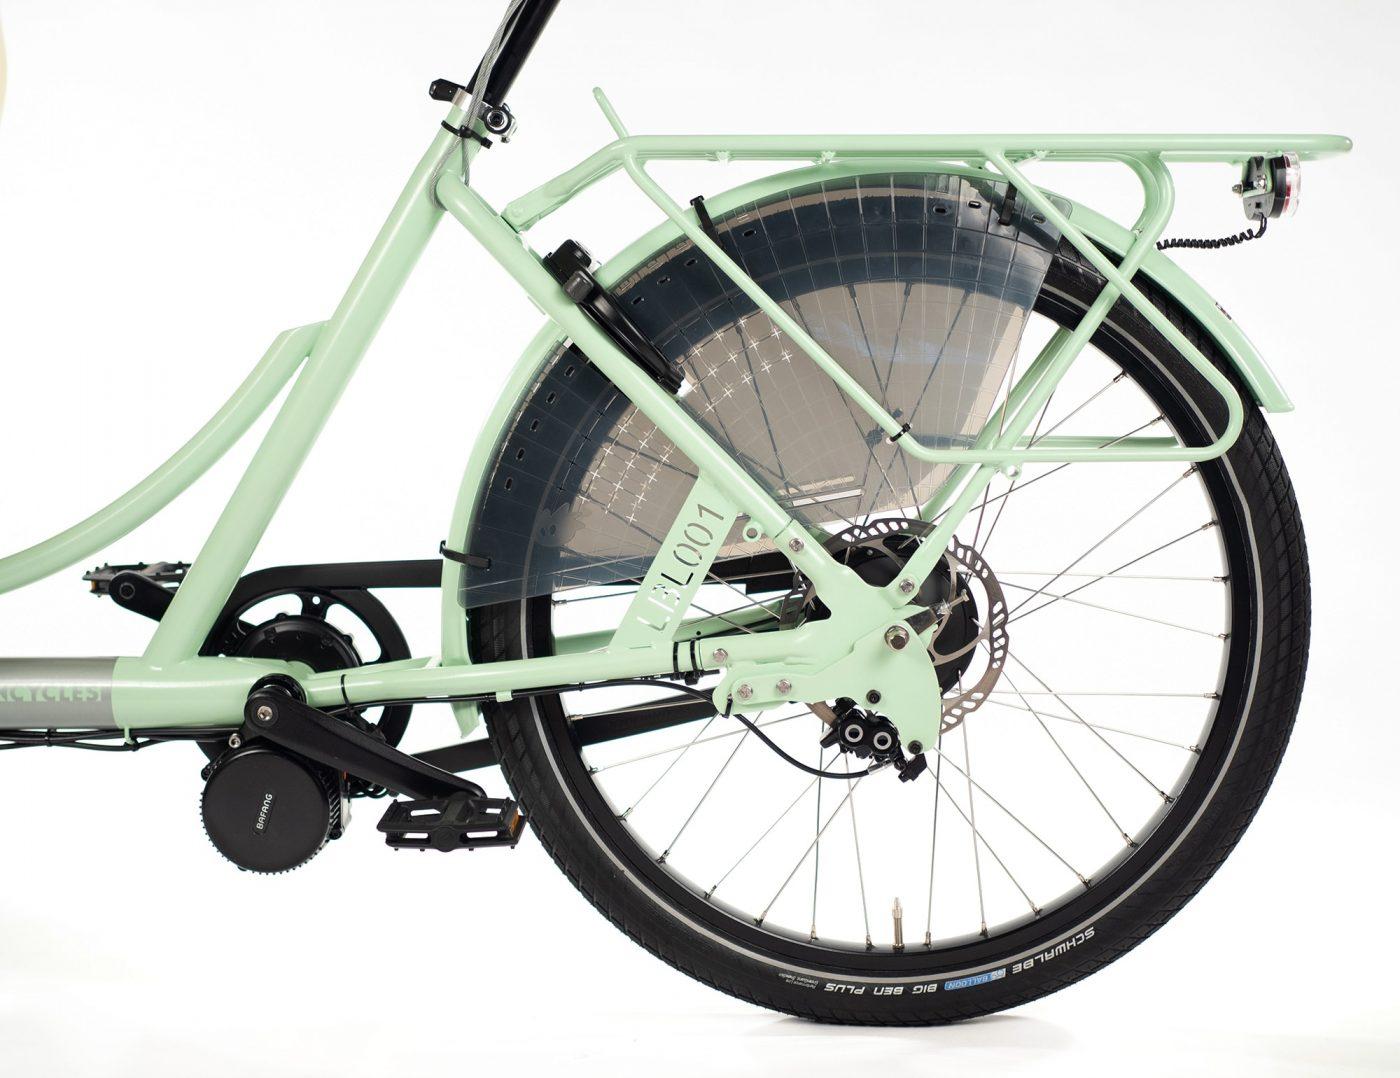 WorkCycles Kr8 MAD bakfiets, child transport bike, dutch e bikes, escape hetch, rear carrier